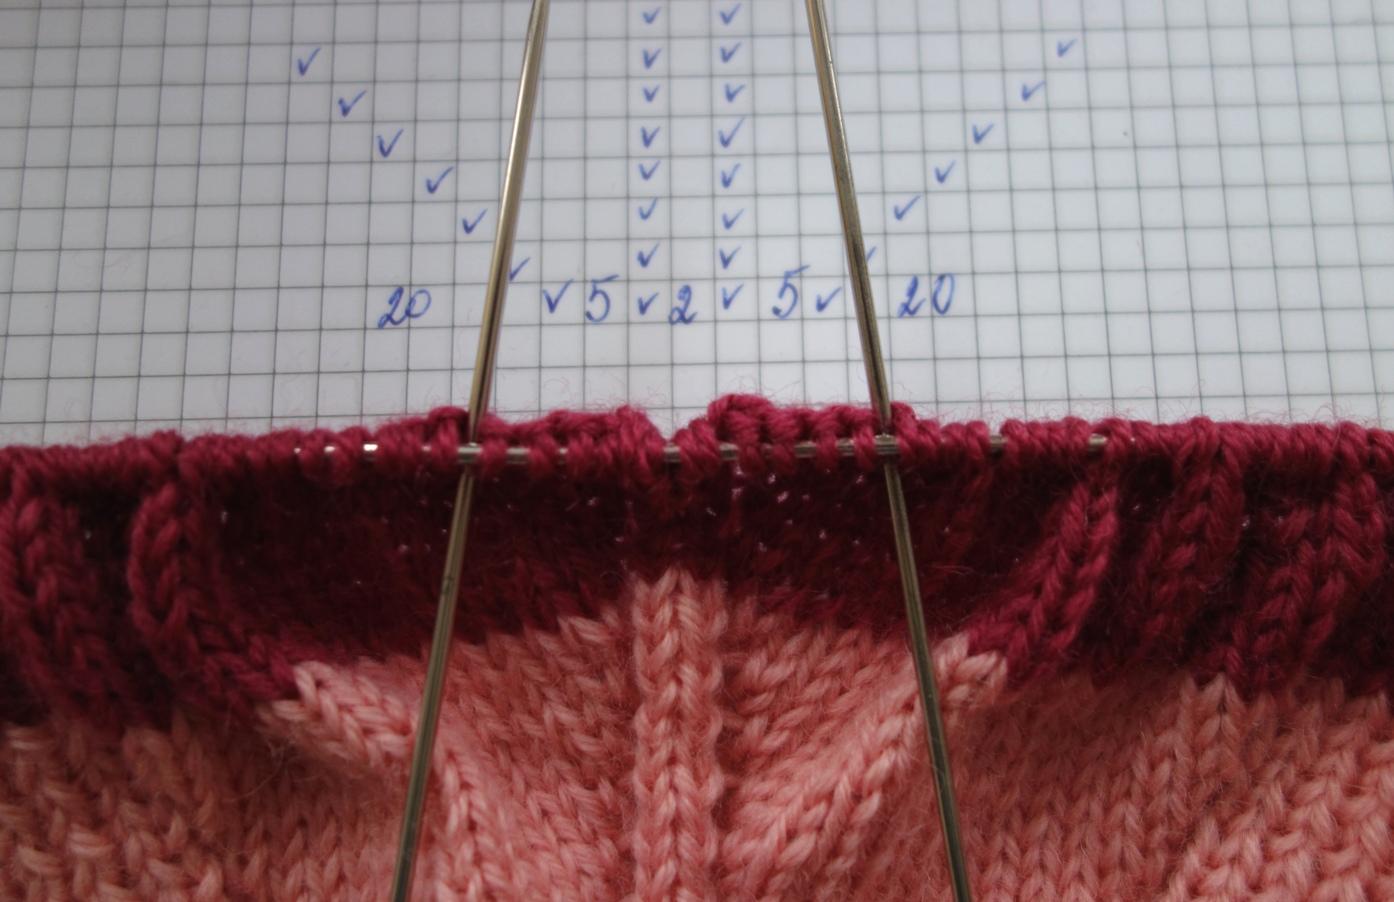 Вязание или вышивание при котором петля заходит за петлю 50